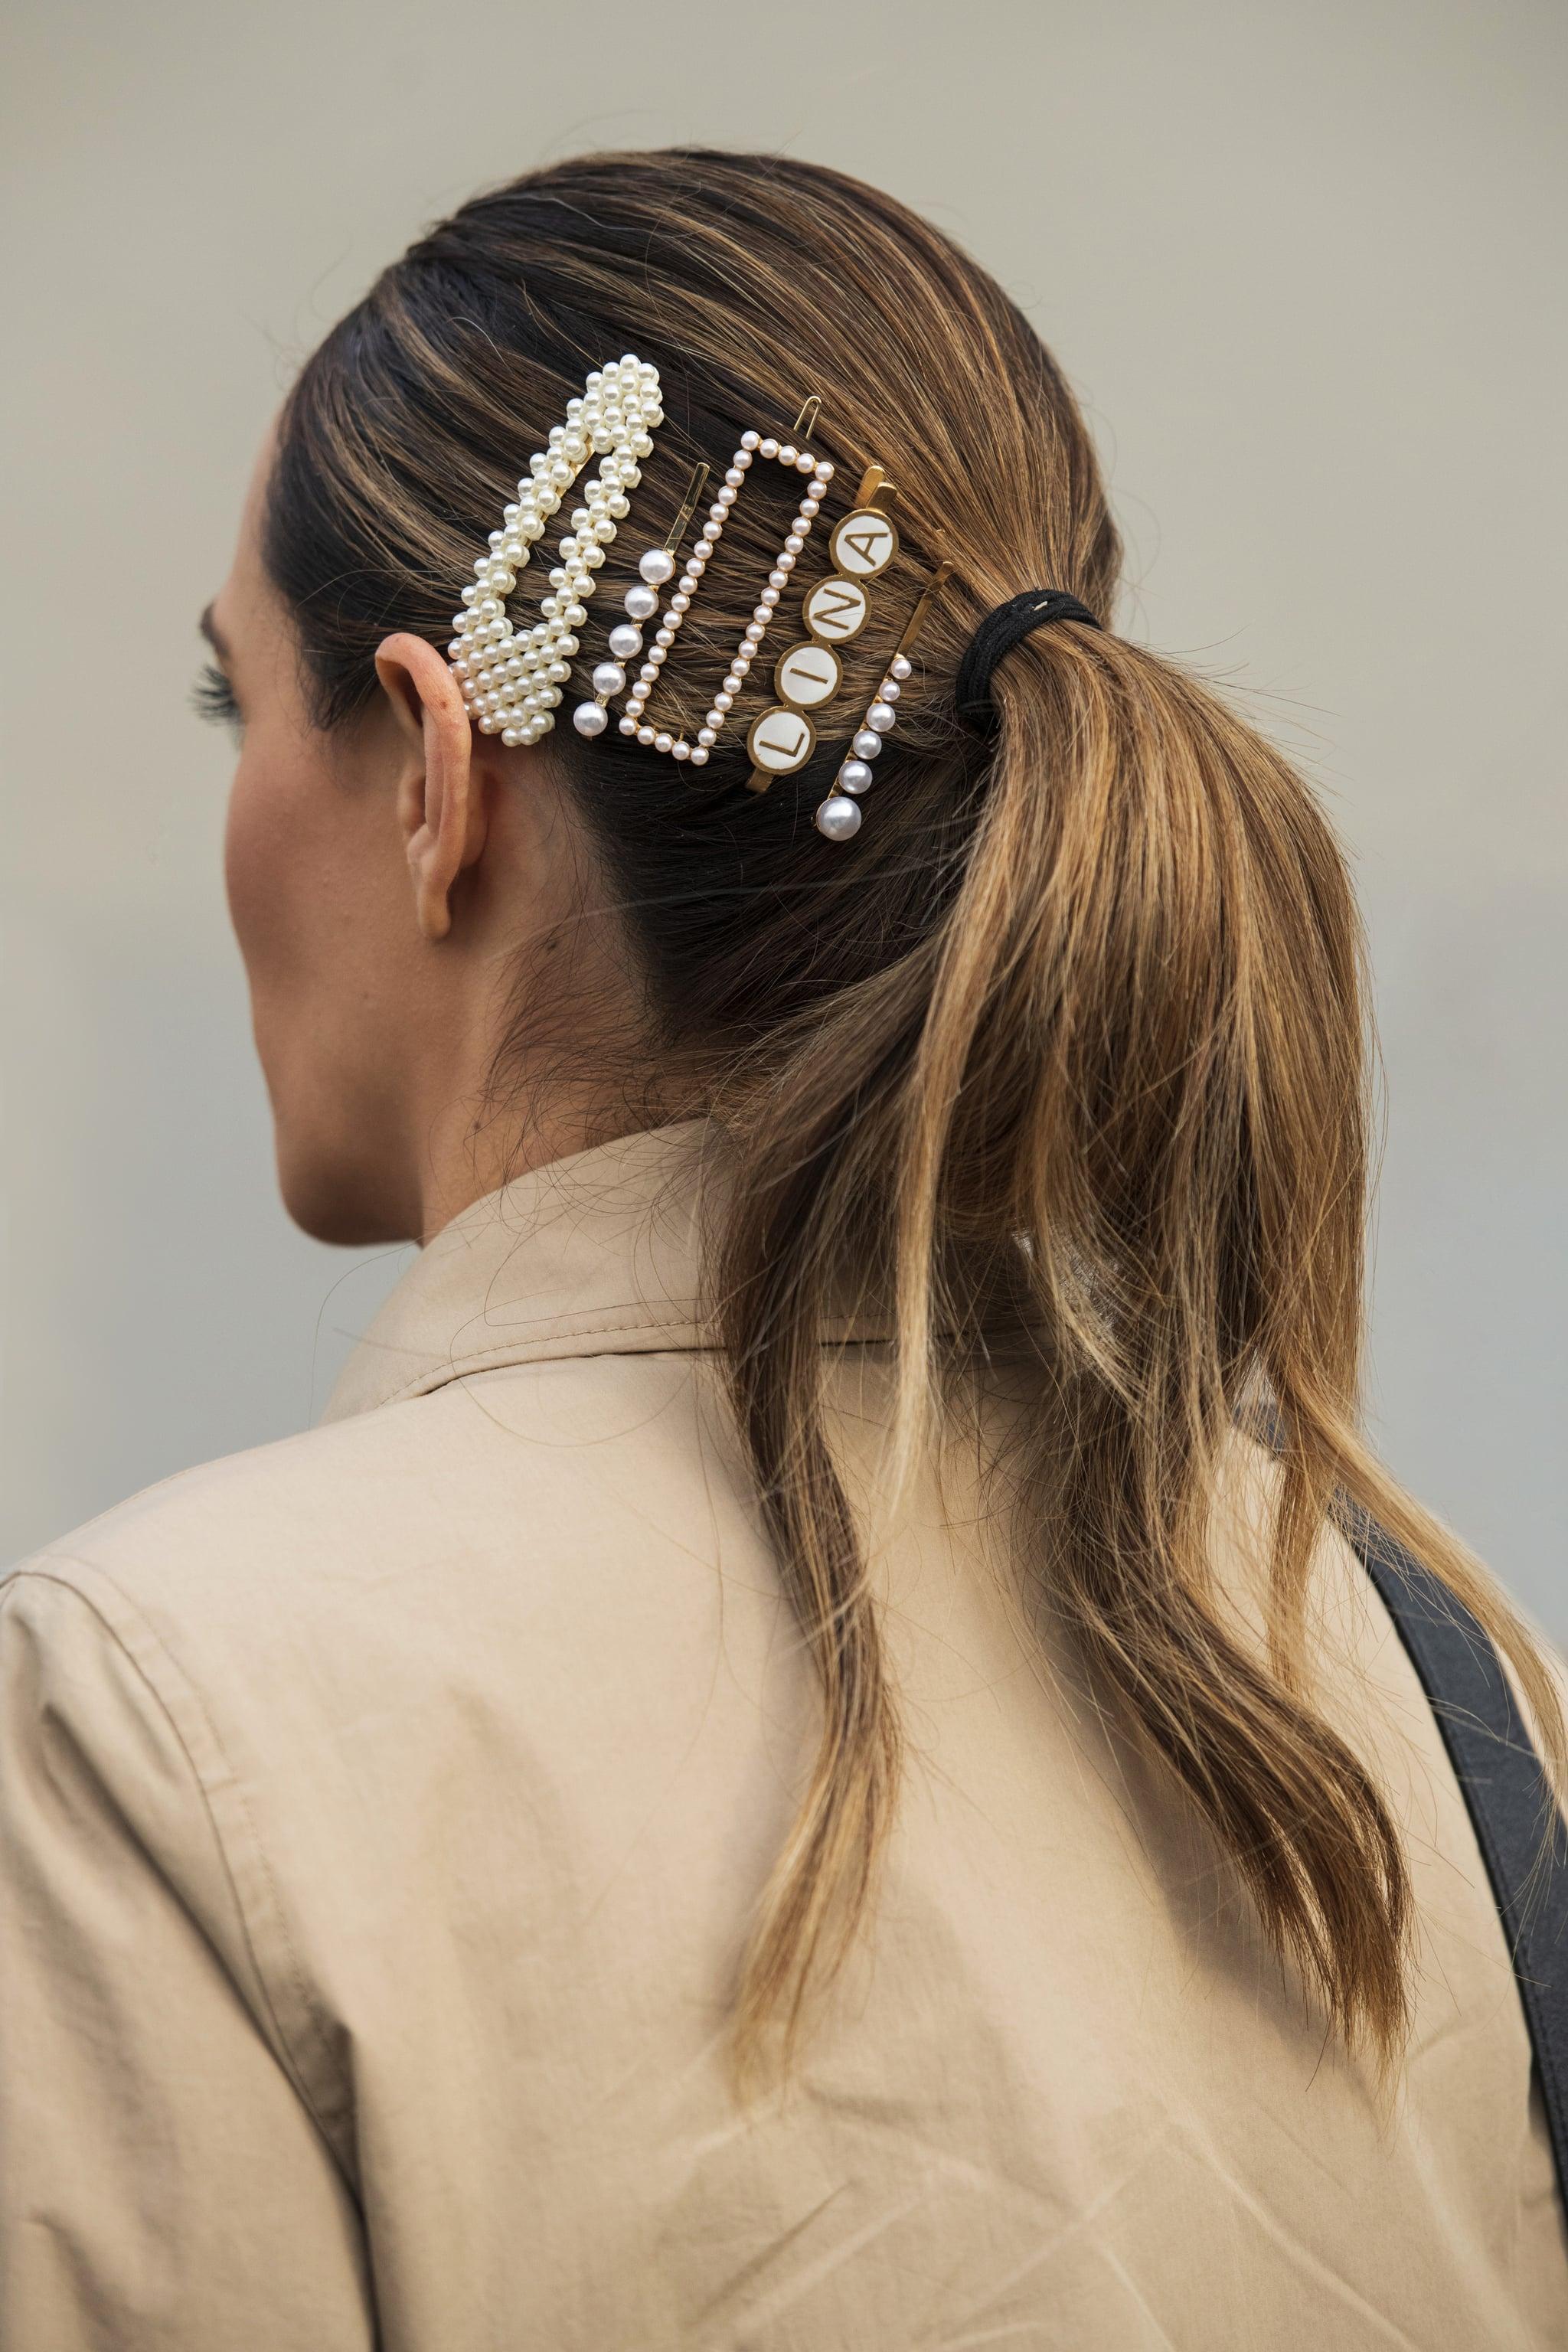 Women Hair Clip Hairband Pin Barrette Hairpin Headdress Decor Gift Fashion Acc